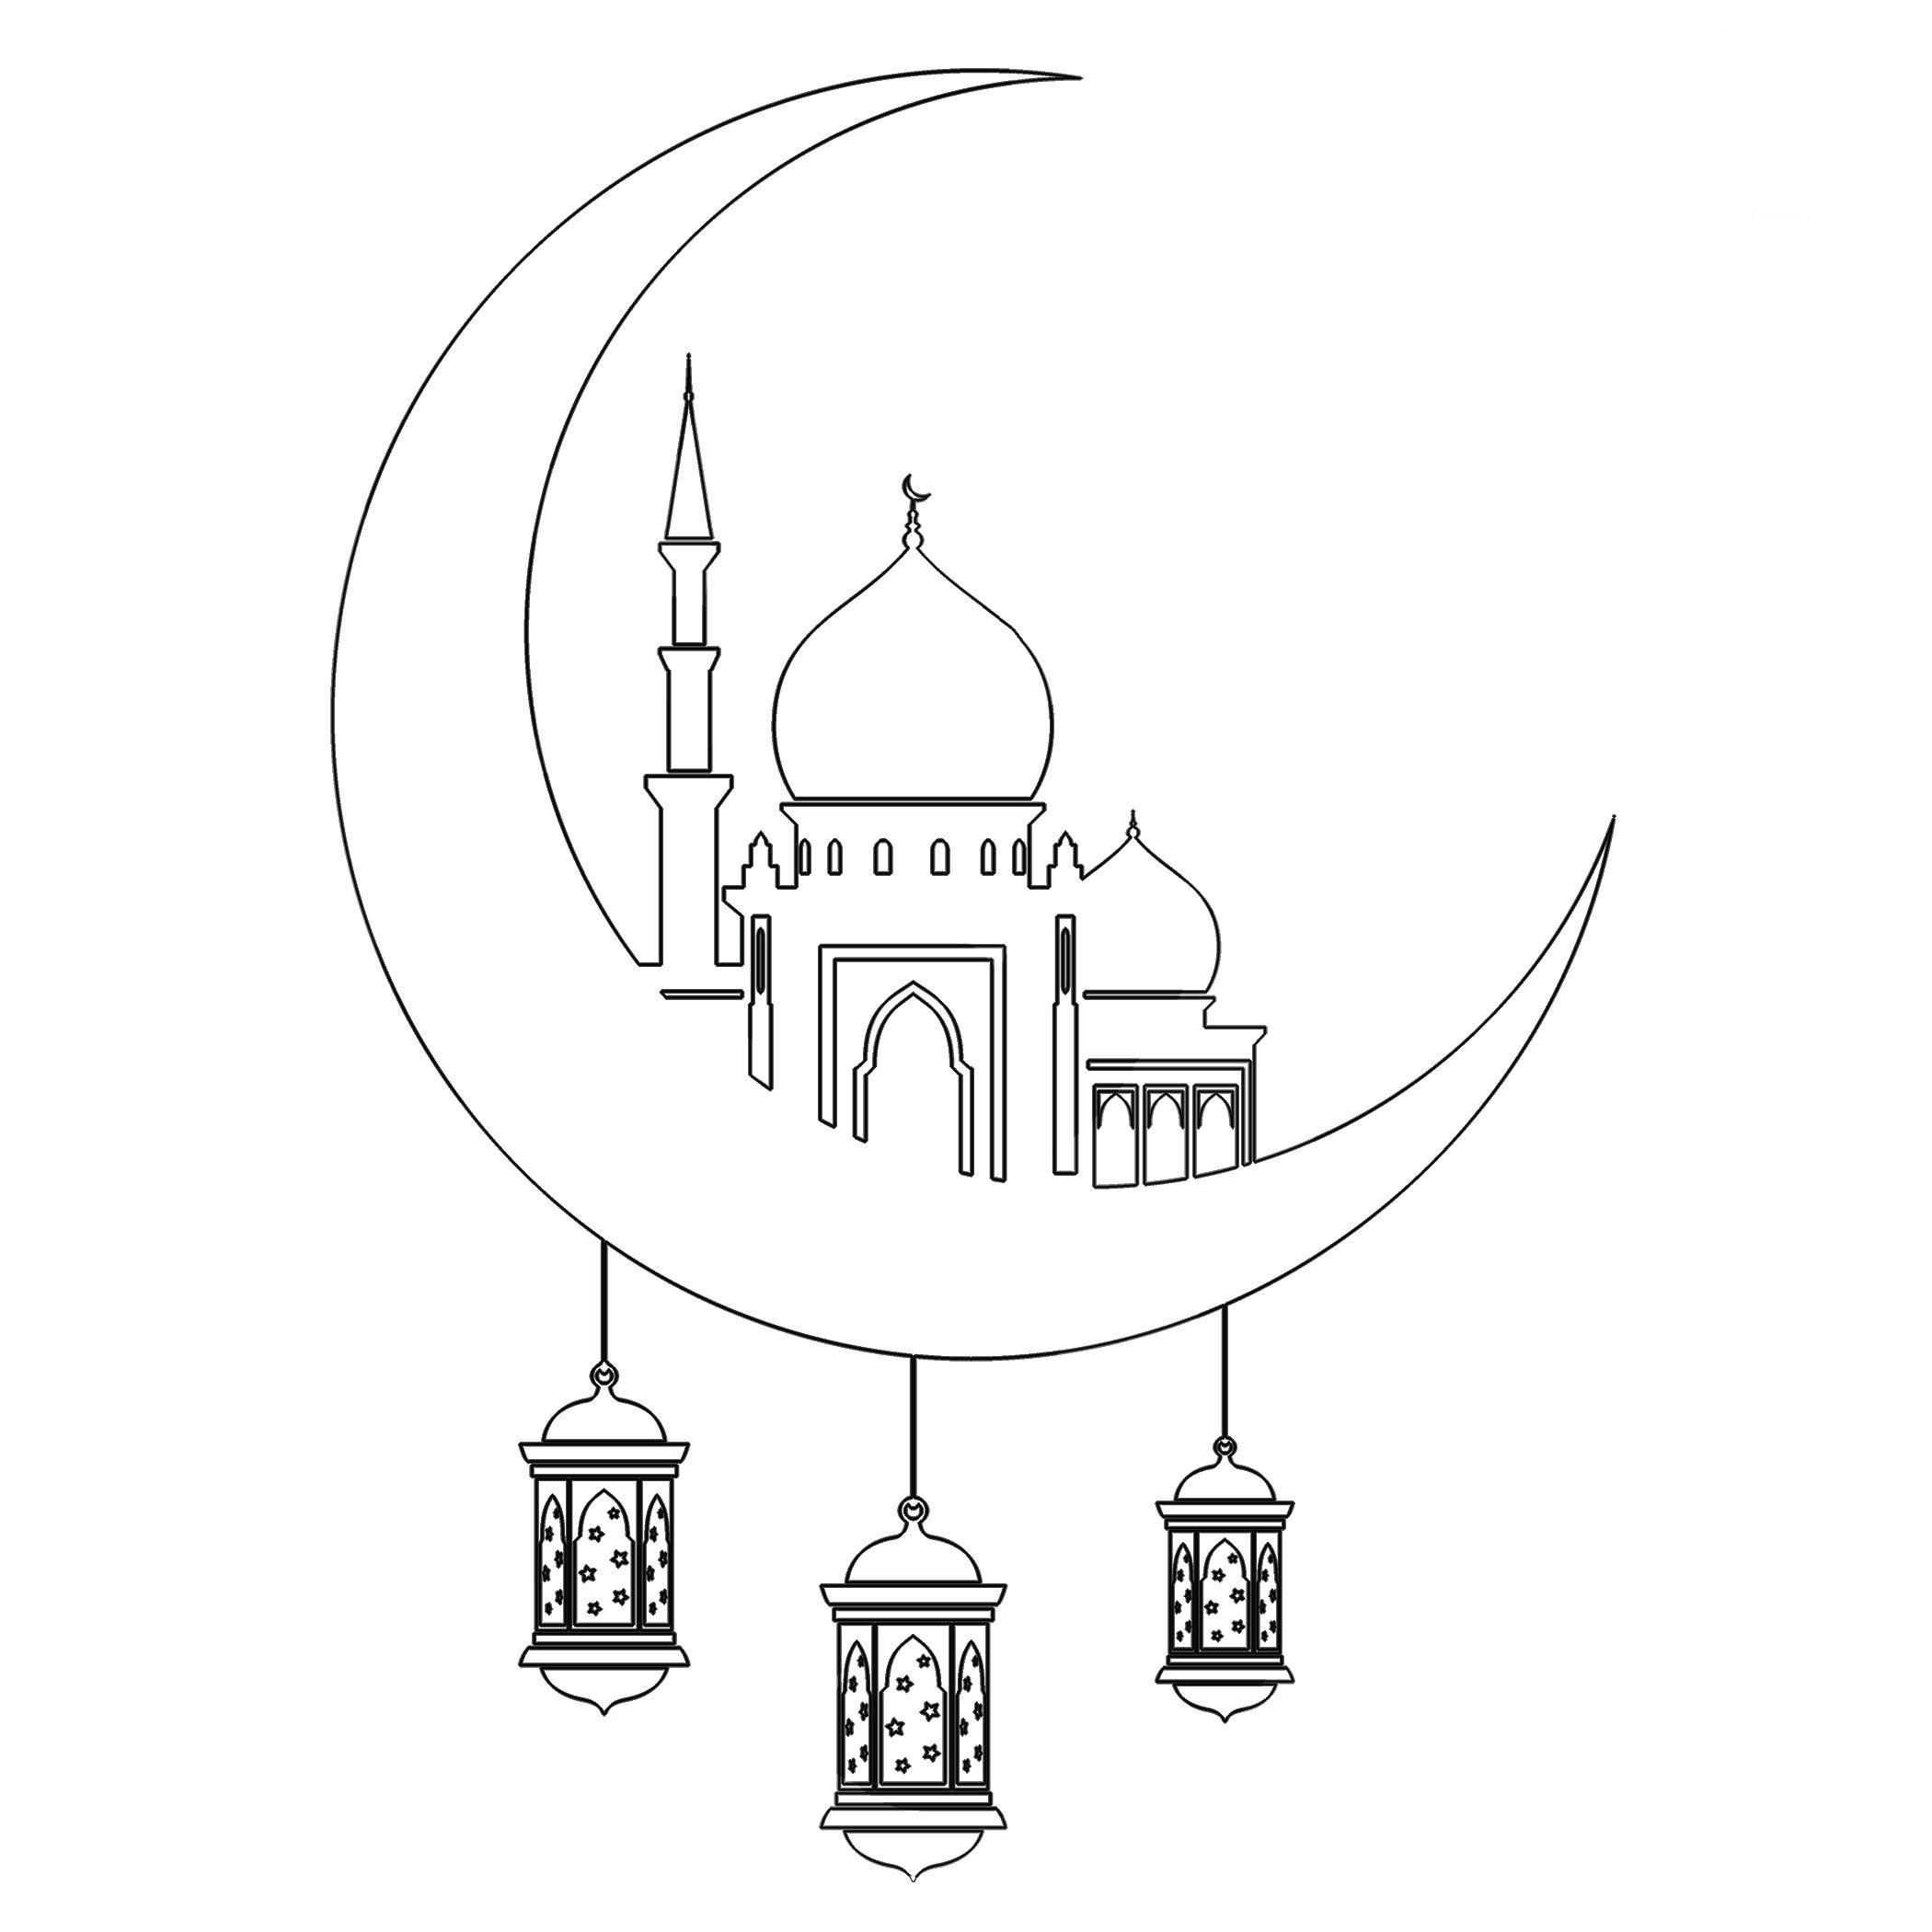 احدث رسومات رمضانيه 2020 موسوعة